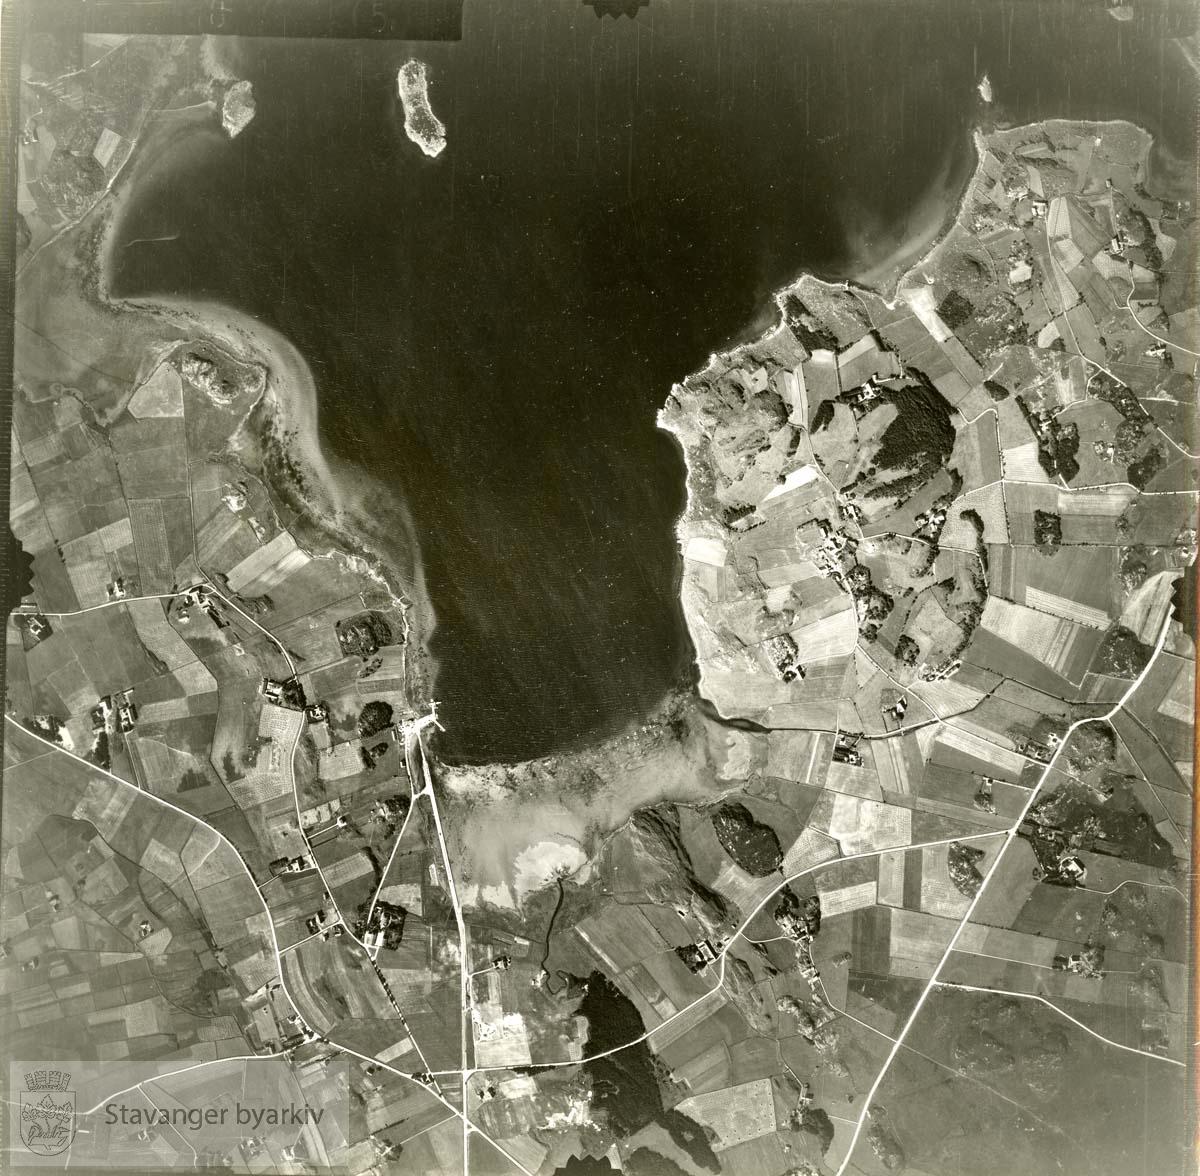 Jfr. kart/fotoplan C25/385..Sømmevågen..Se ByStW_Uca_002 (kan lastes ned under fanen for kart på Stavangerbilder)